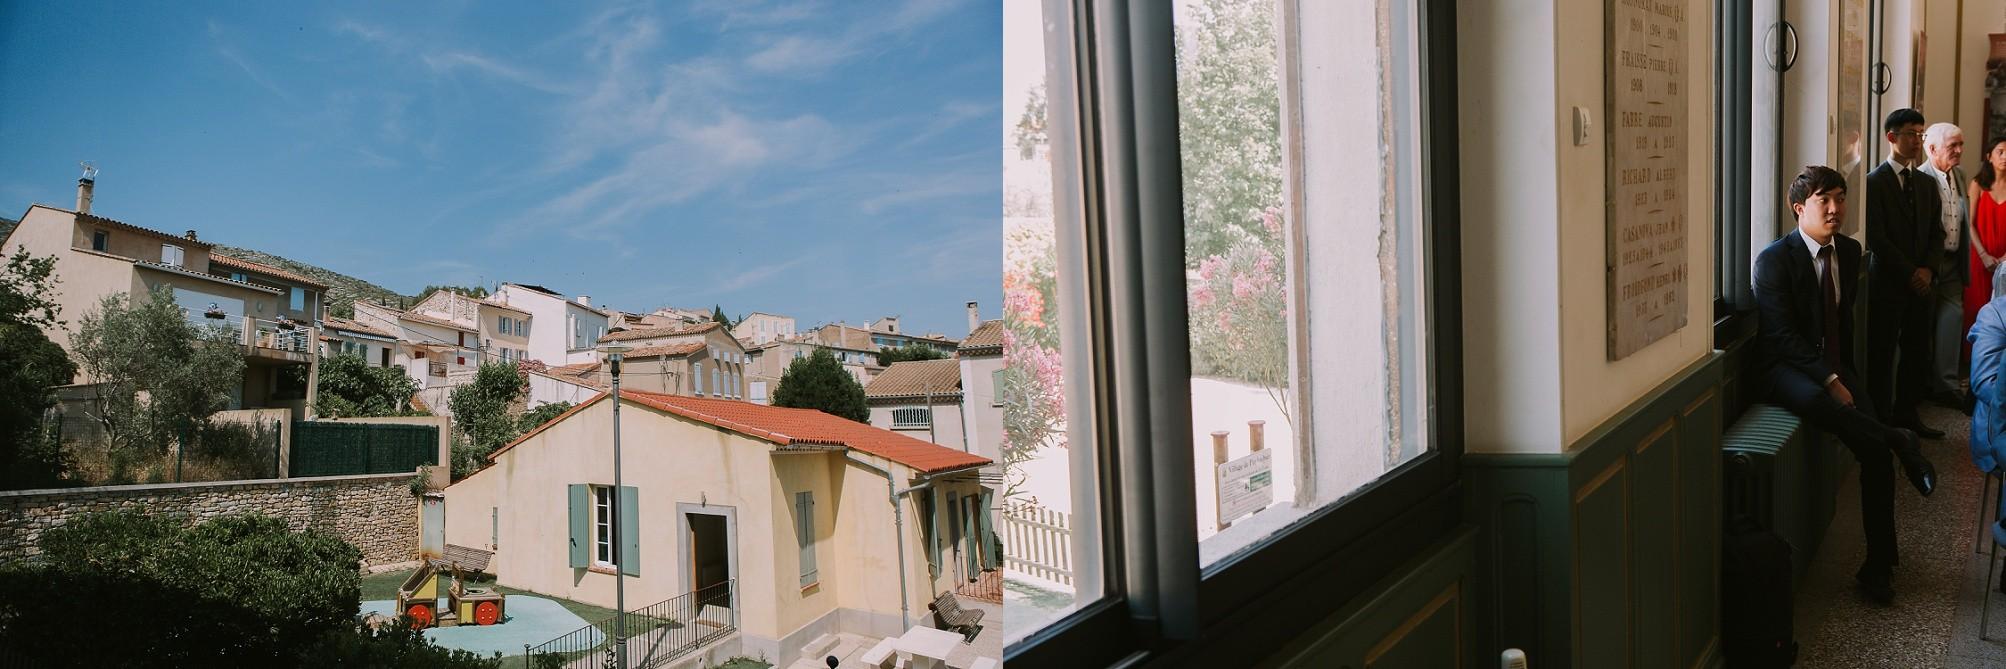 katerynaphotos-mariage-photographe-puyloubier-provence-aix-en-provence-sud-de-la-france_0361.jpg